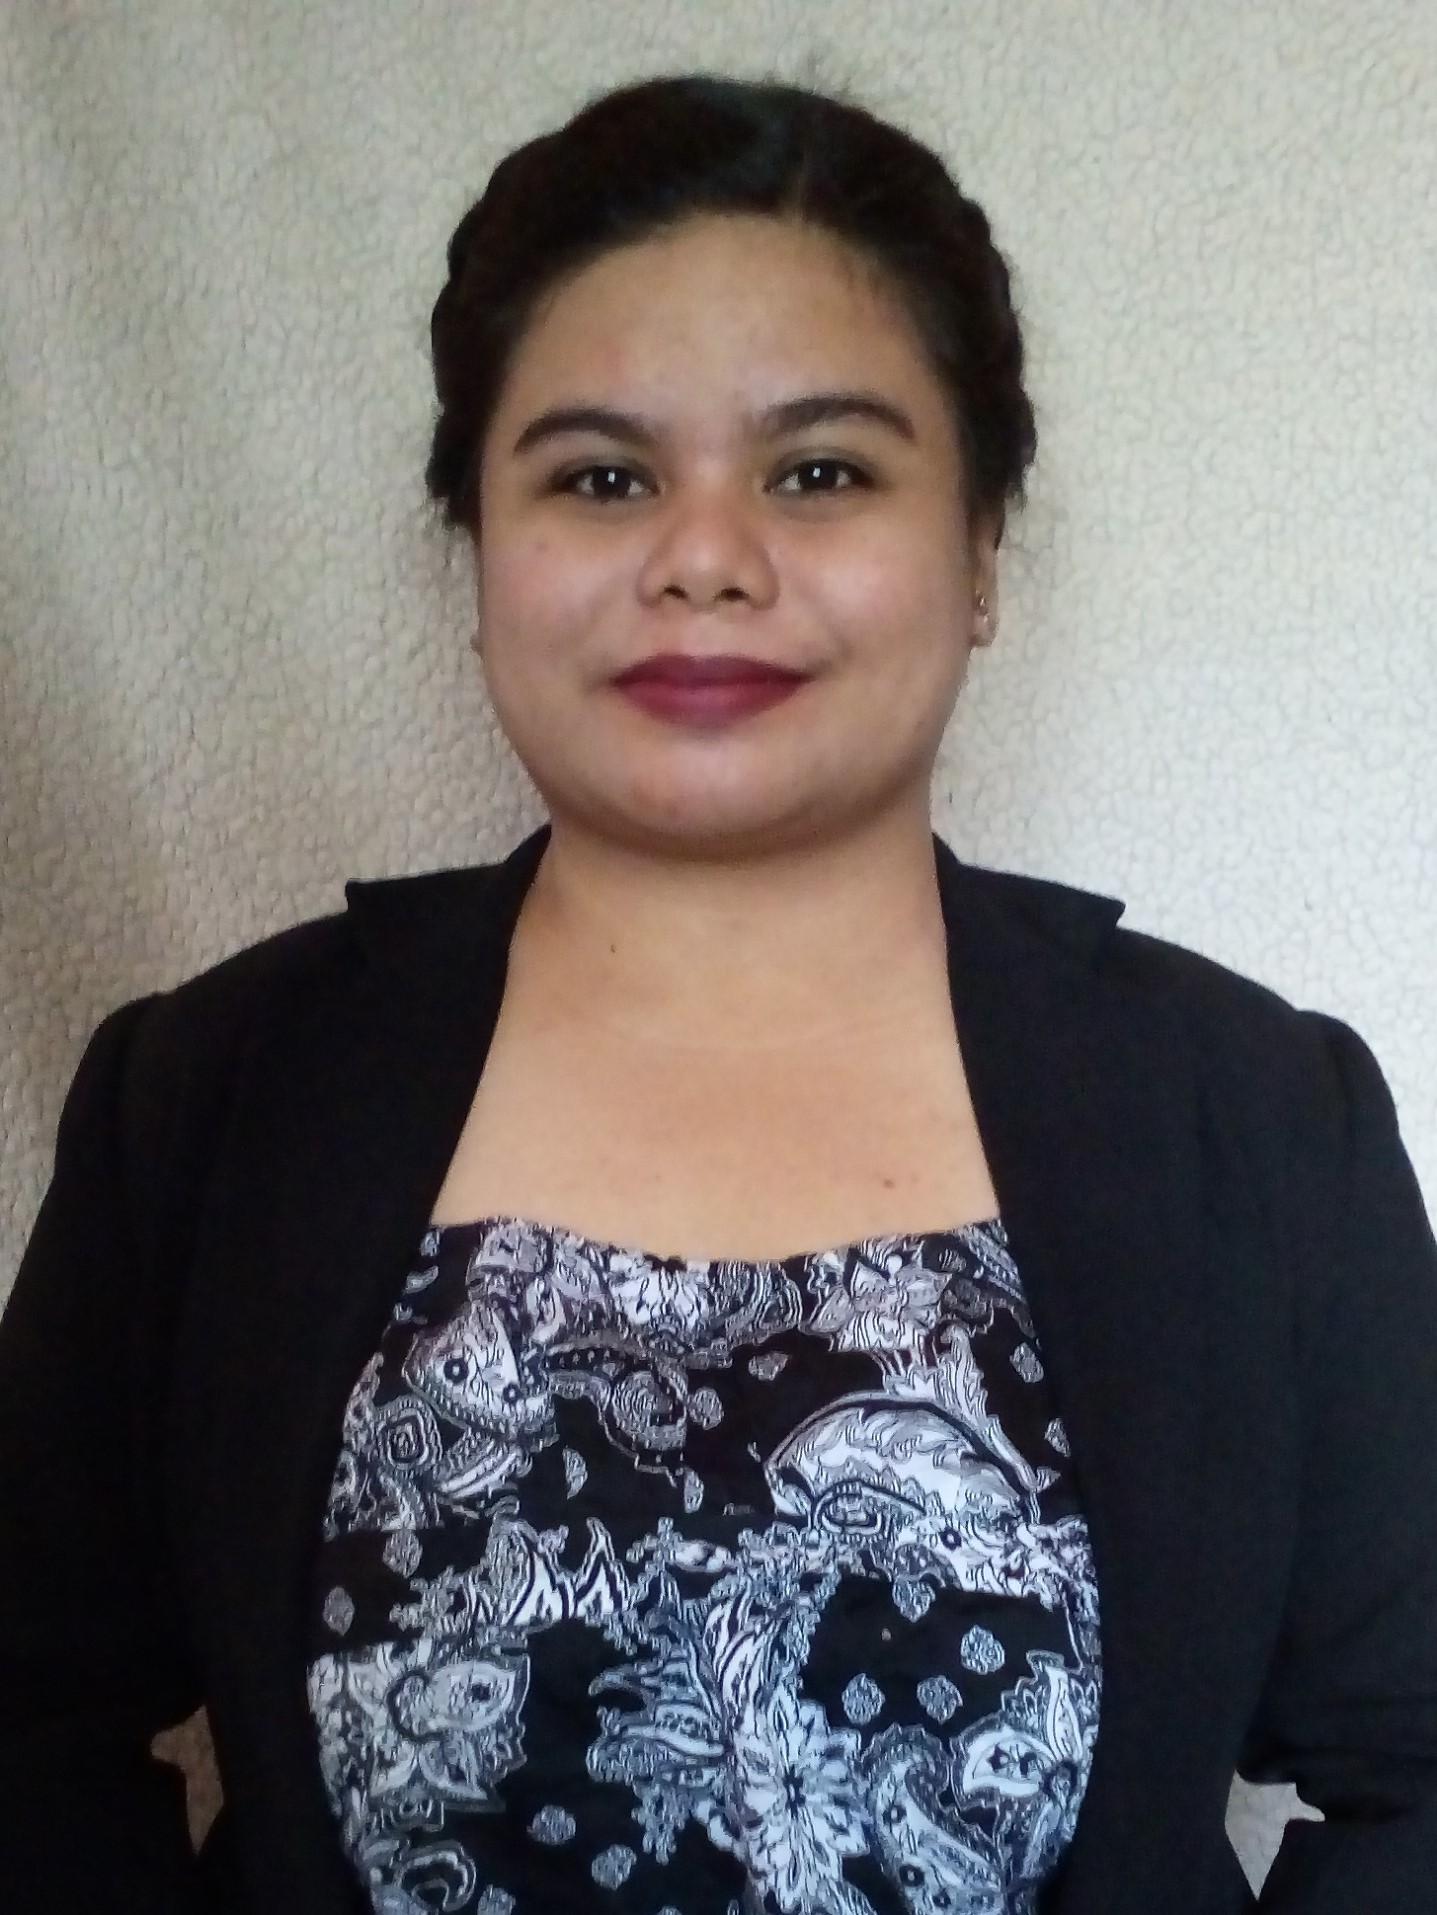 Ms. Maricris Balcueva